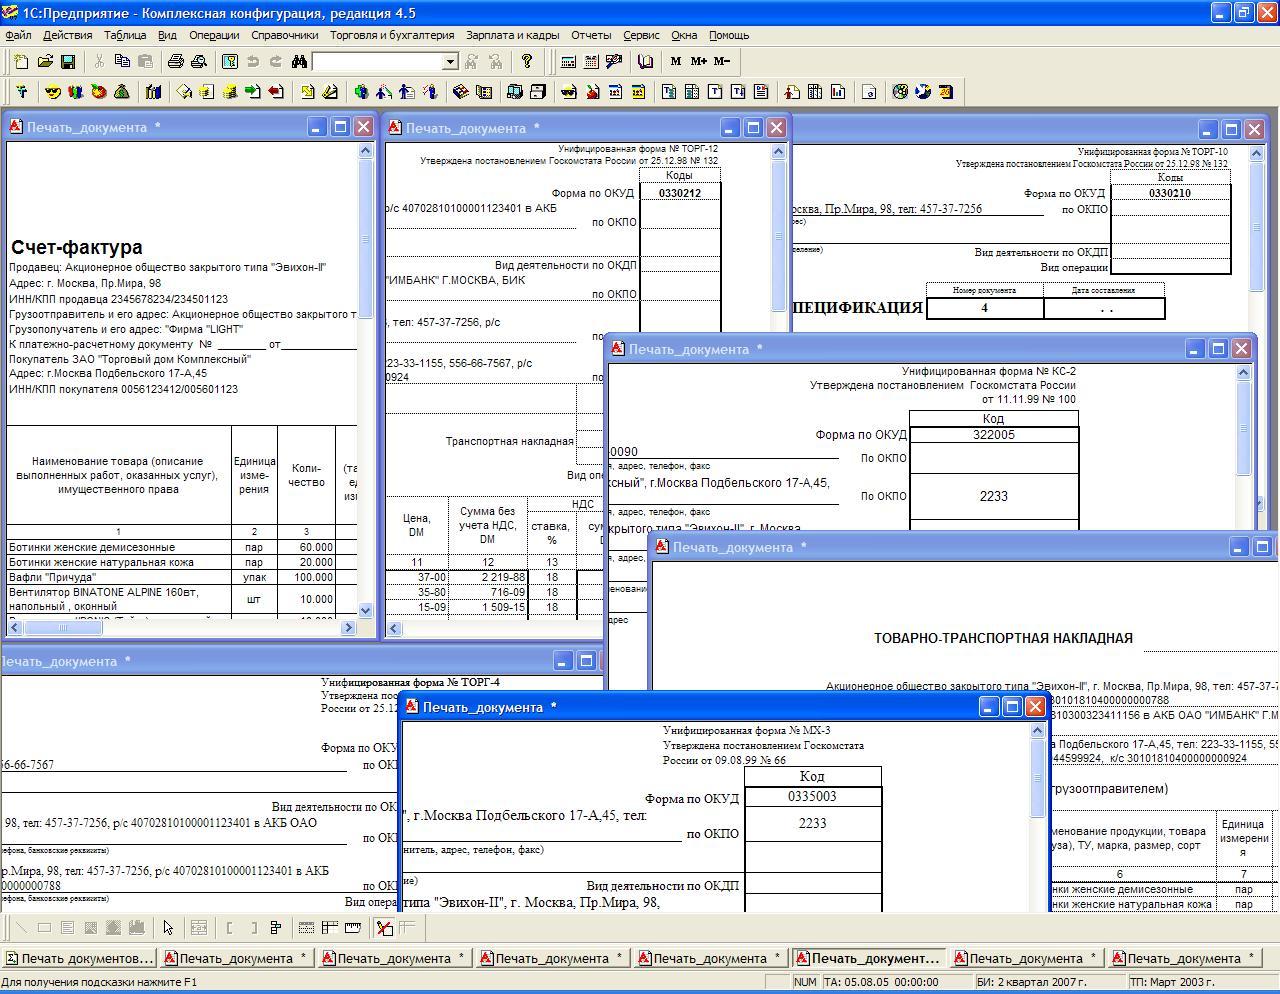 налоговая накладная бланк 0т 13.12.11